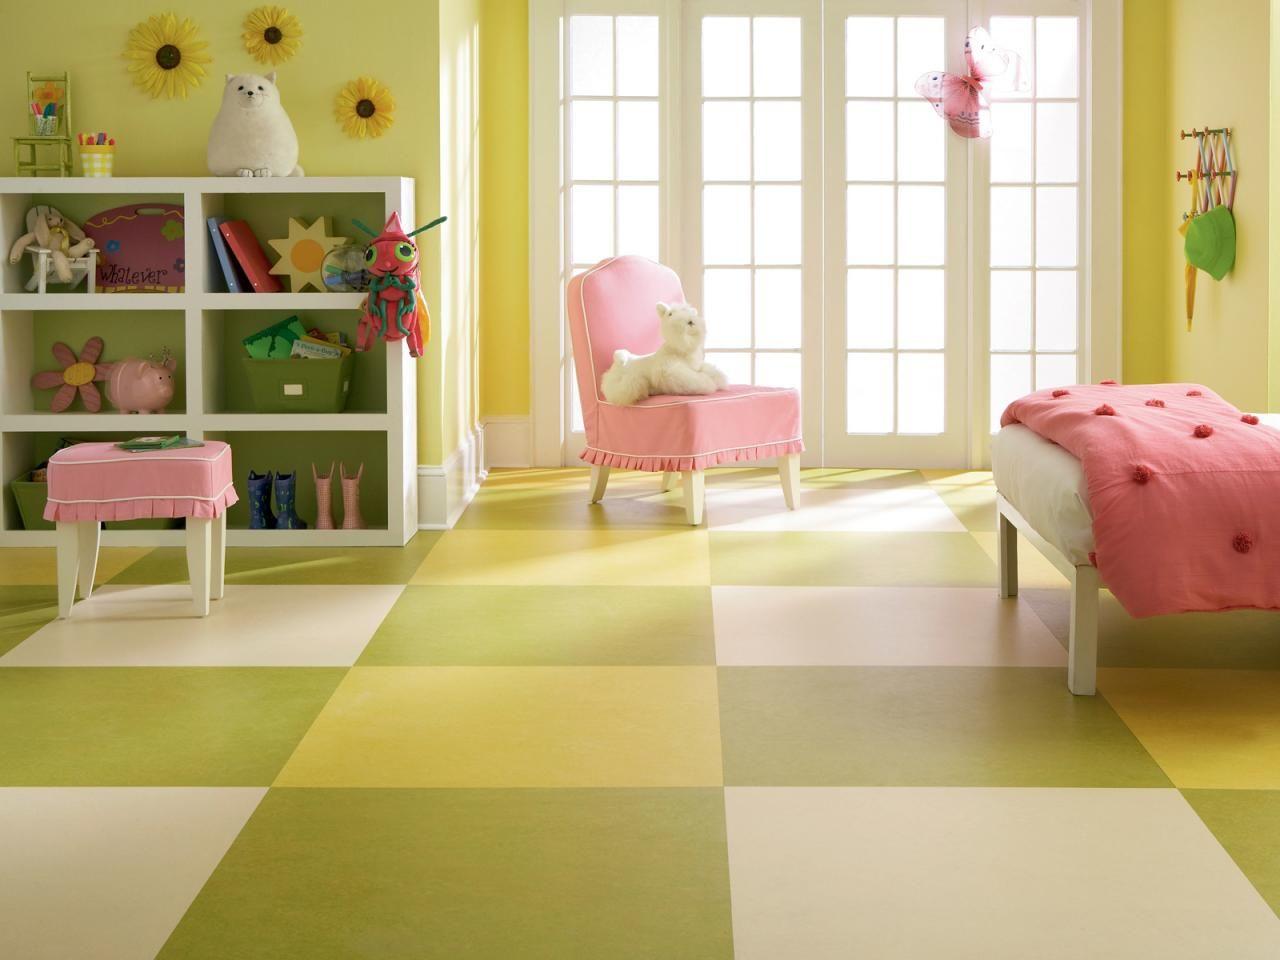 Linoleum Floors Bedroom Flooring Linoleum Flooring Vinyl Flooring